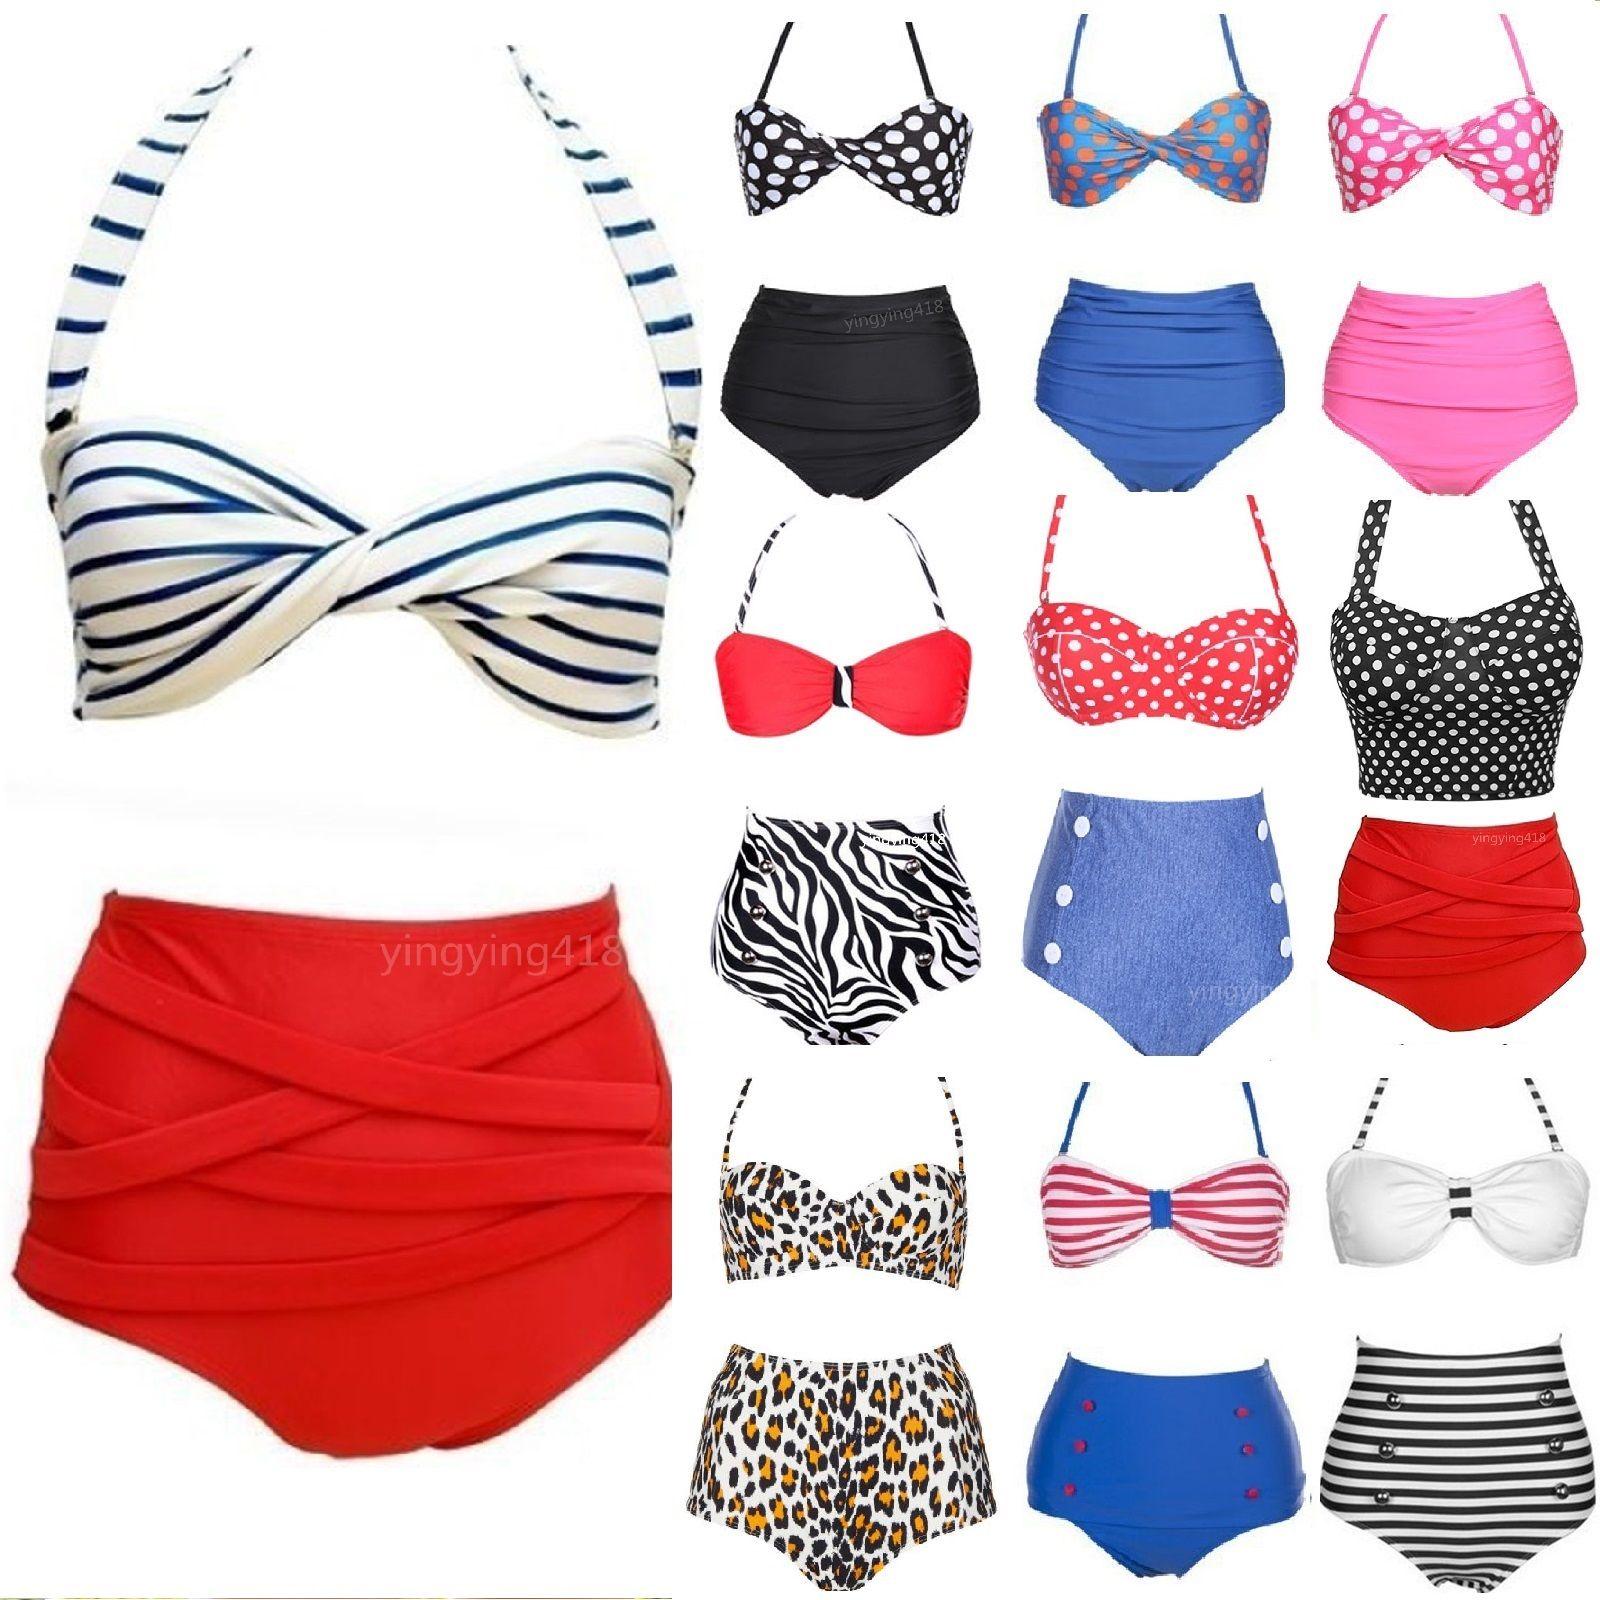 uk beach style vintage high waist halterneck top bikini